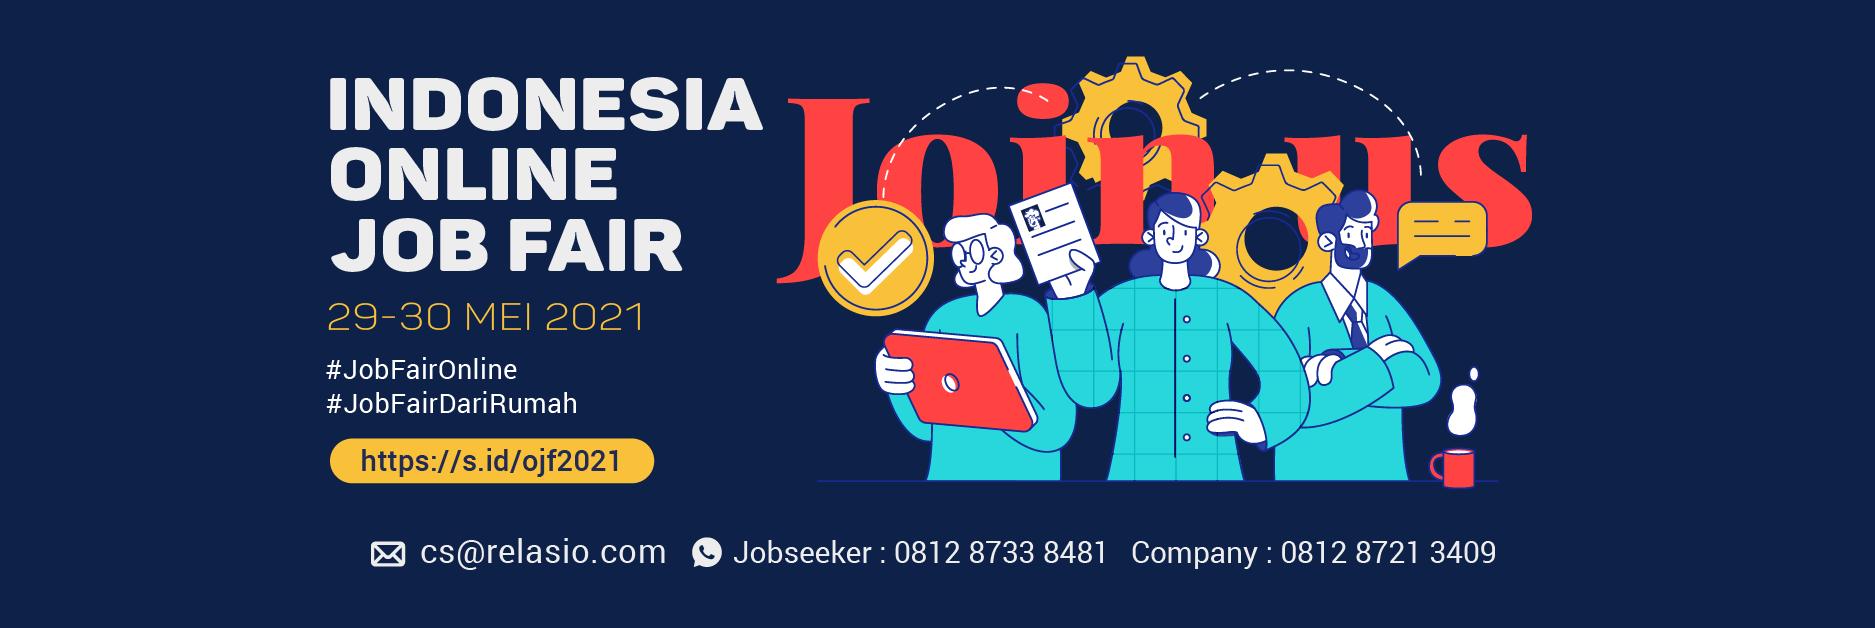 Job Fair Online Relasio.com April 2021